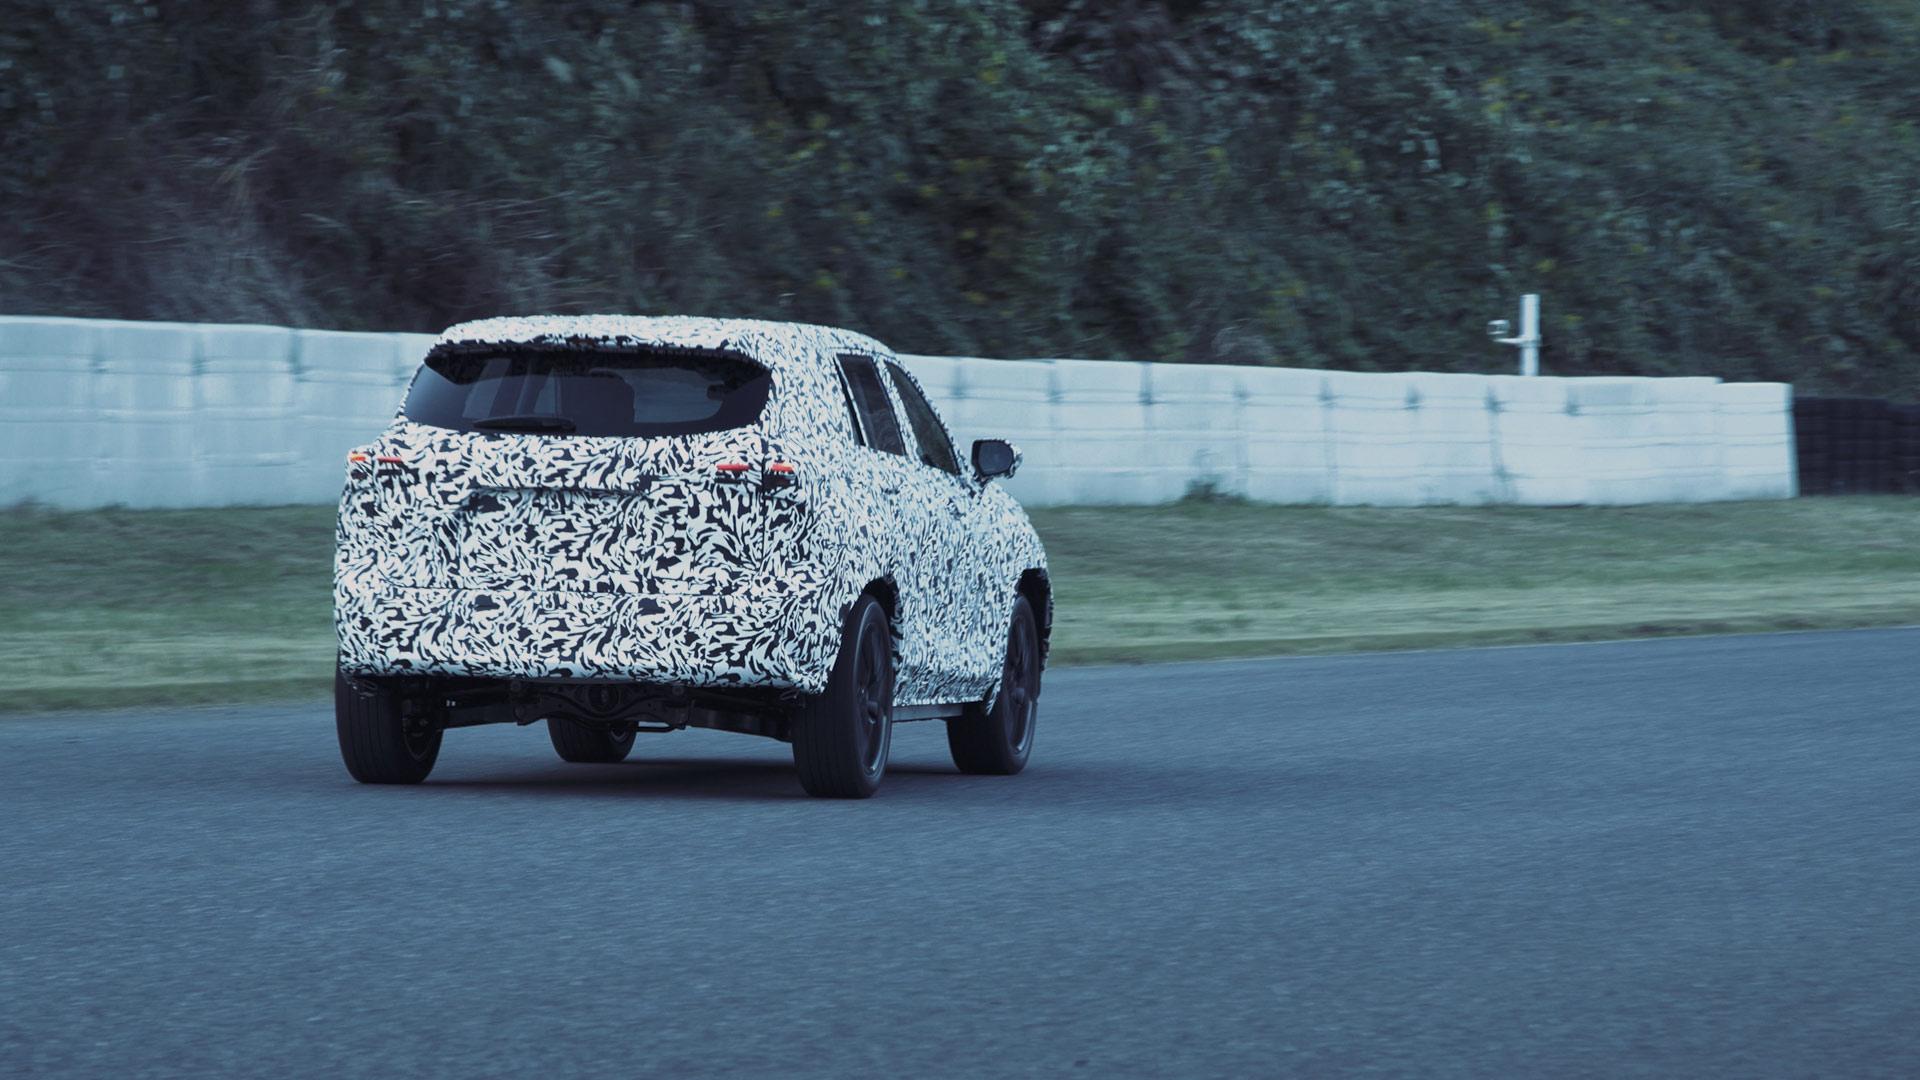 Lexus Direct4 Galleryitem 08 1920x1080px